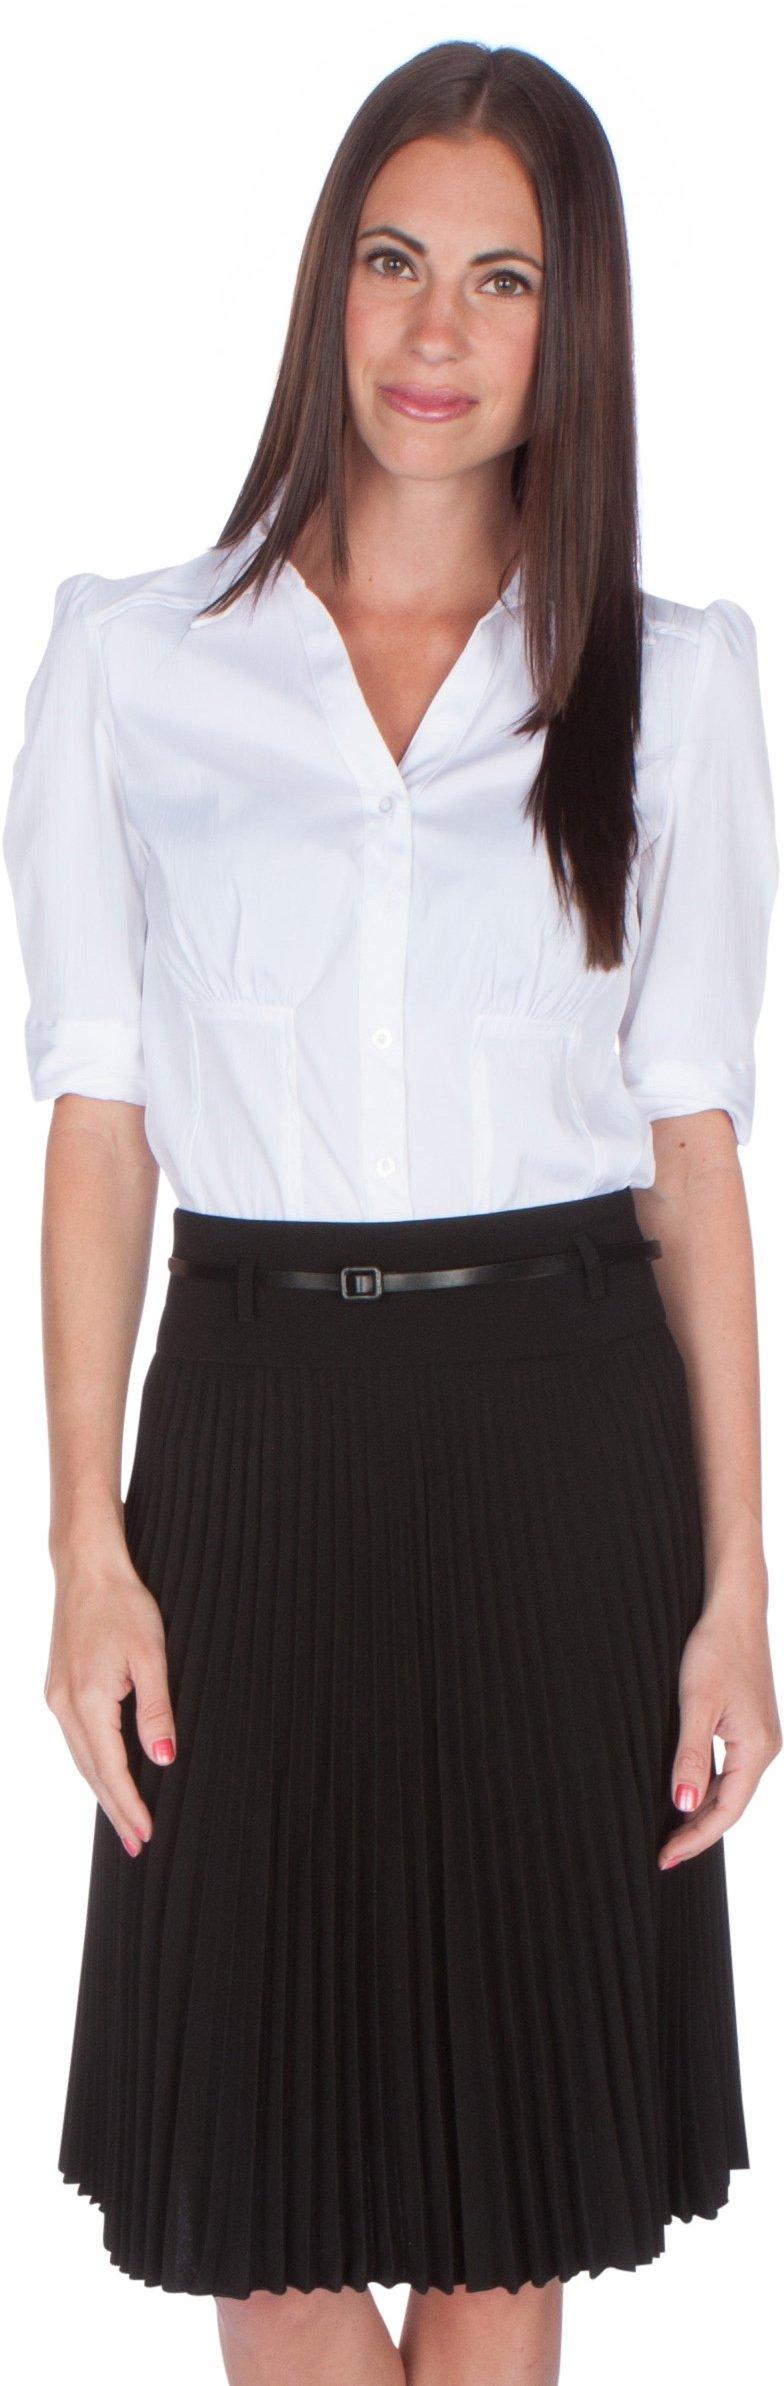 Sakkas FV3543 Knee Length Pleated A-Line Skirt with Skinny Belt - Black/X-Large by Sakkas (Image #3)